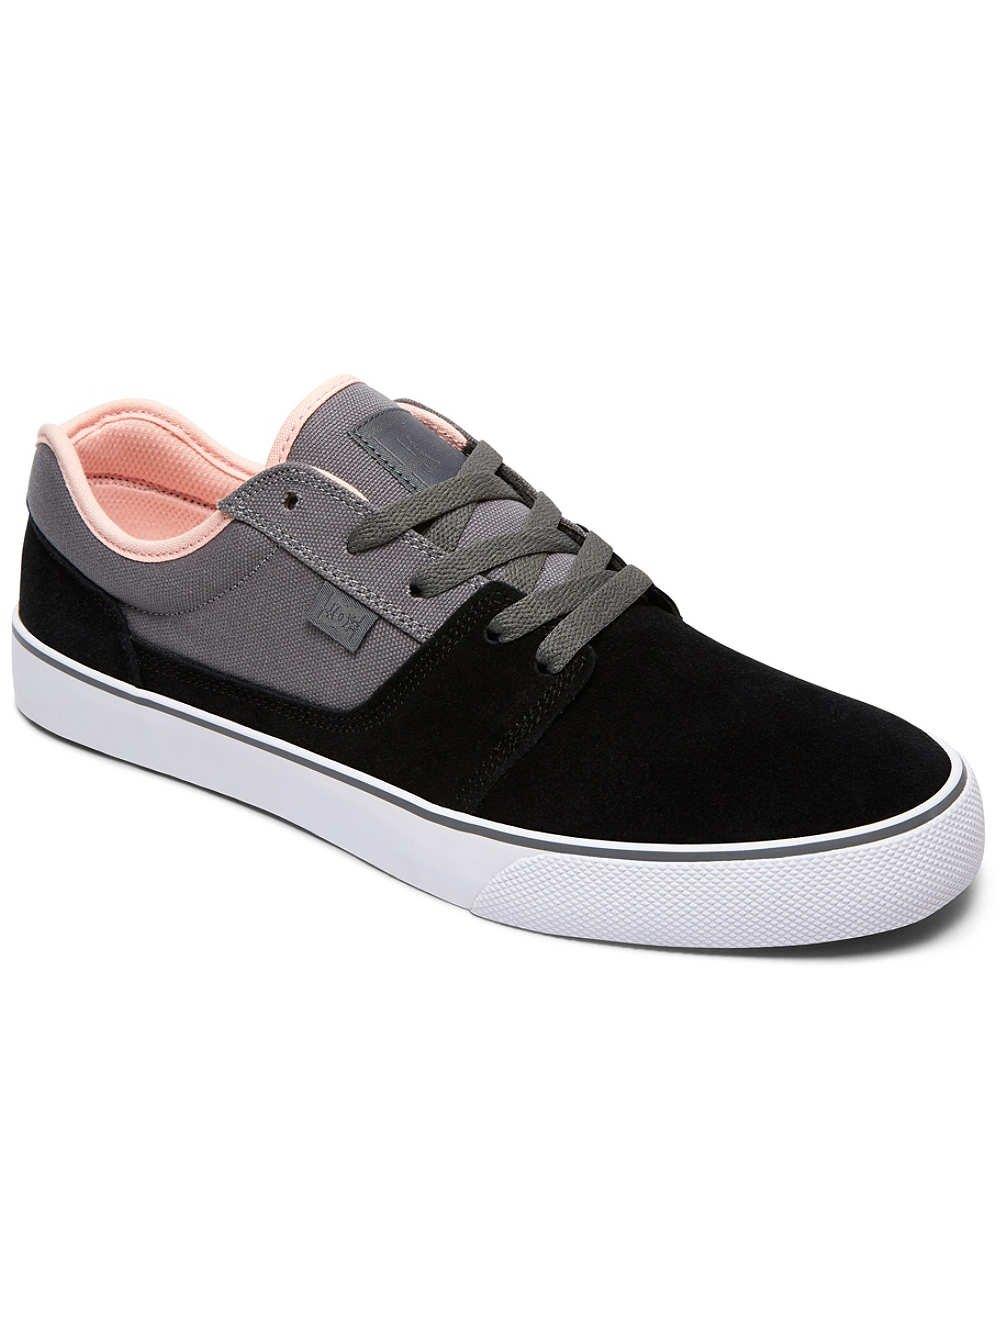 DC Shoes TONIK SHOE D0302905 - Zapatillas de ante para hombre 45 EU Grey/Pink